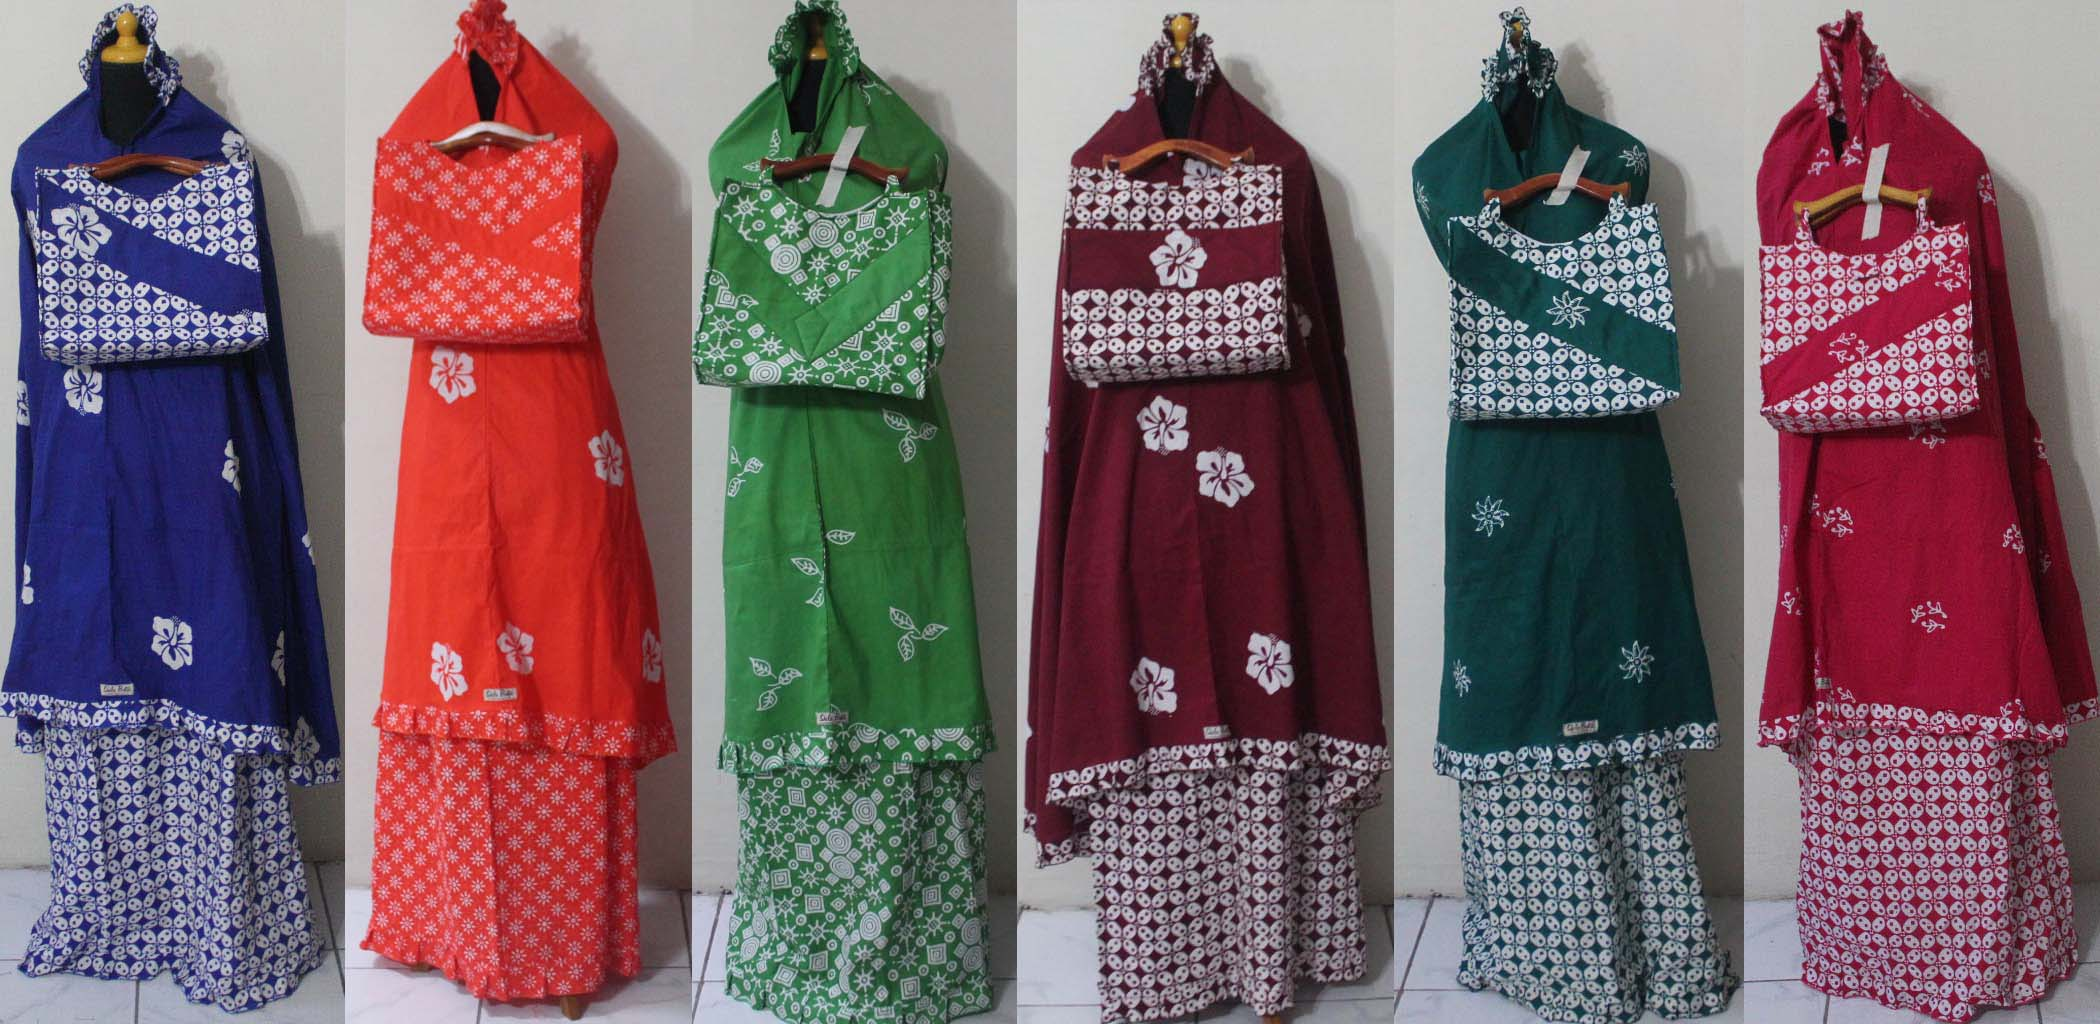 Jual Mukena Batik di Jogja  Hubungi 083840387800  jual batik